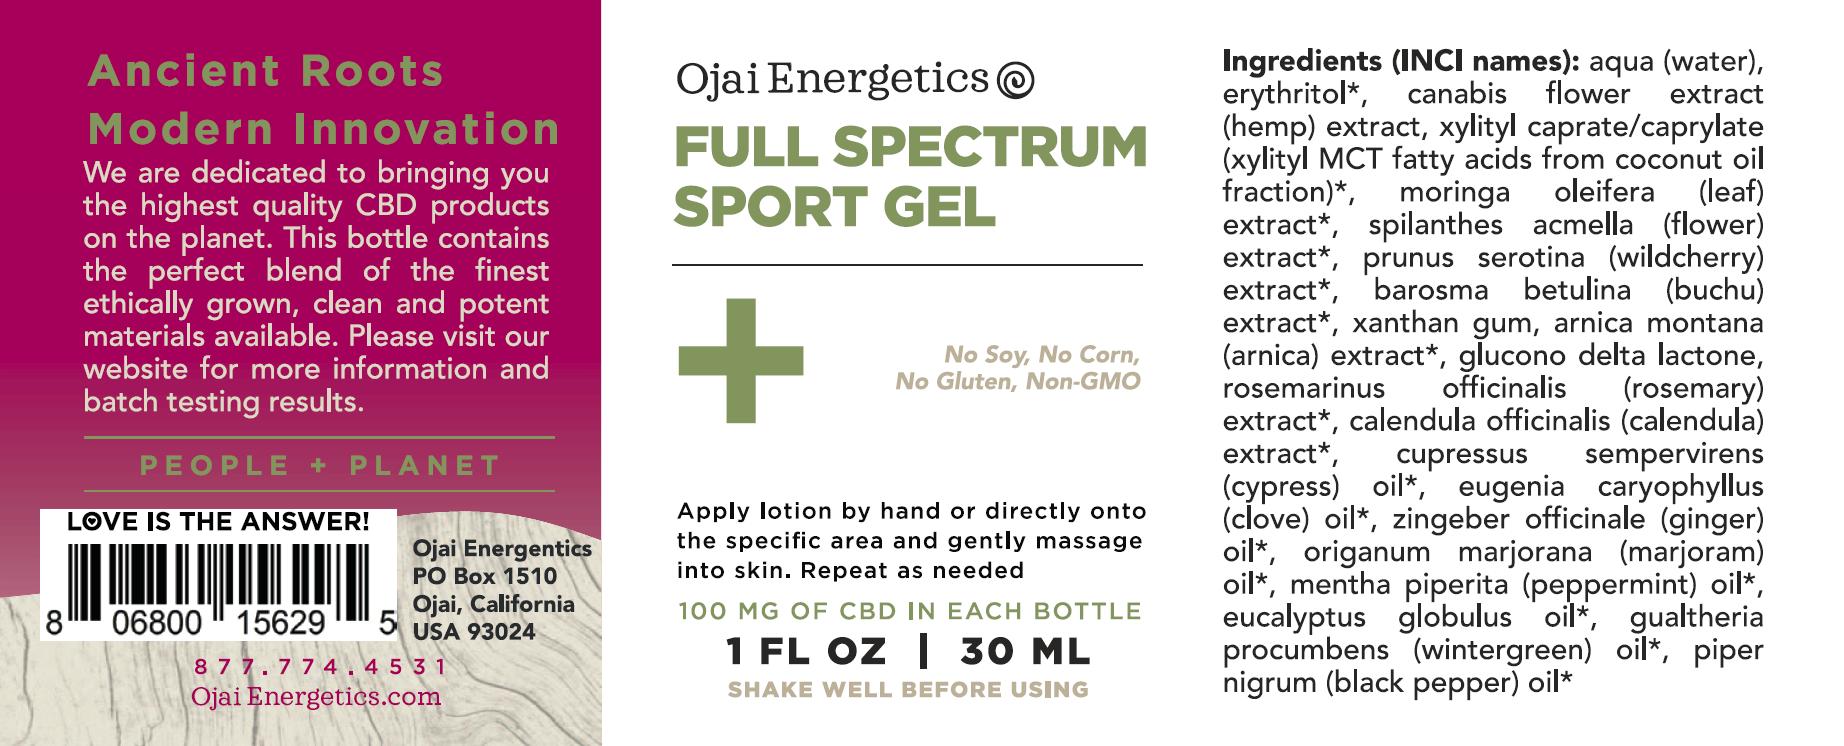 ojai energetics full spectrum cbd sports gel ingredients